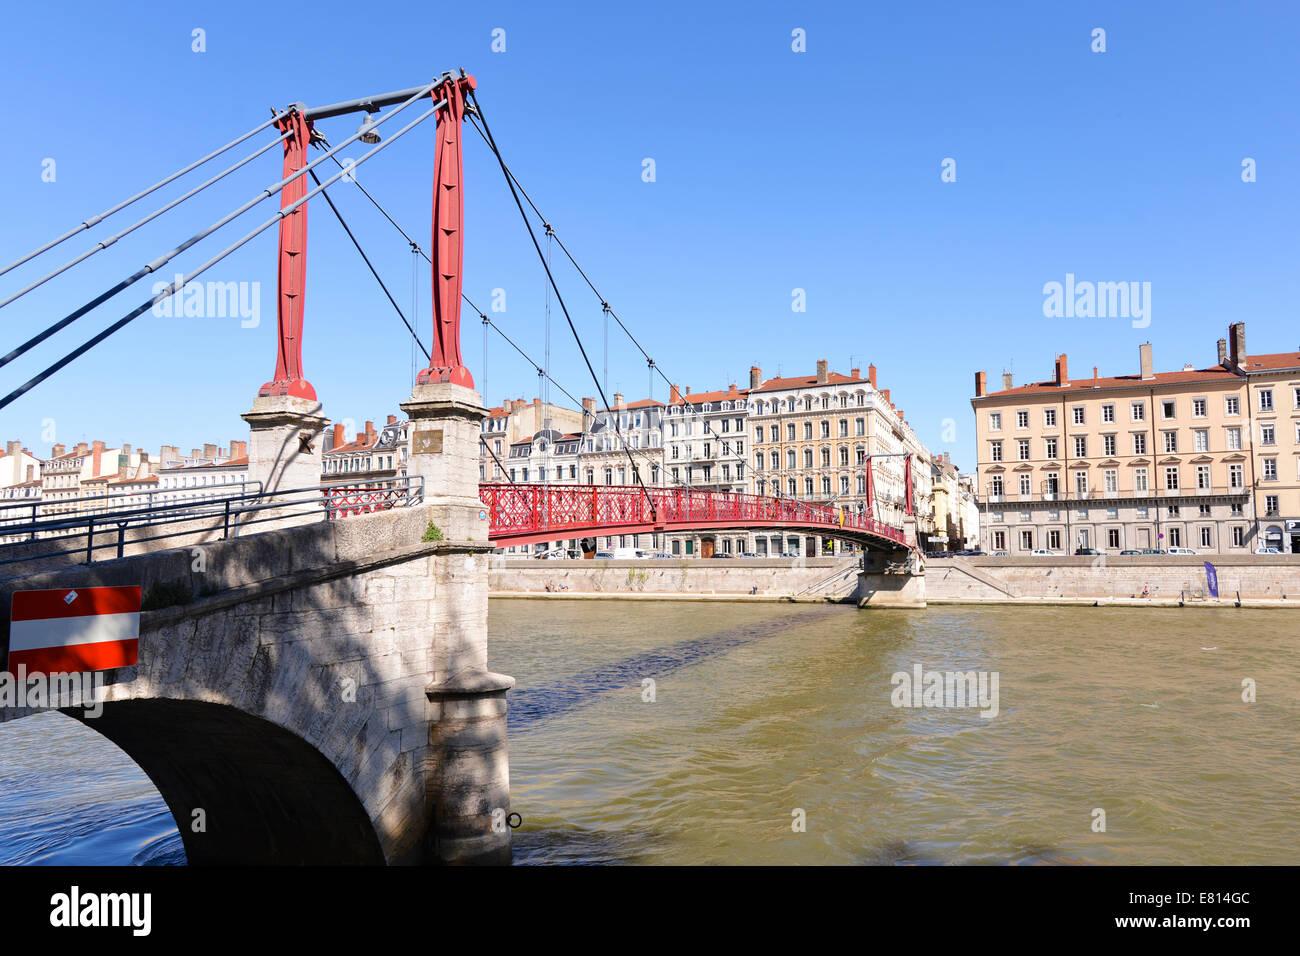 Pedestrian foot bridge over the Rhone in Lyon, France - Stock Image